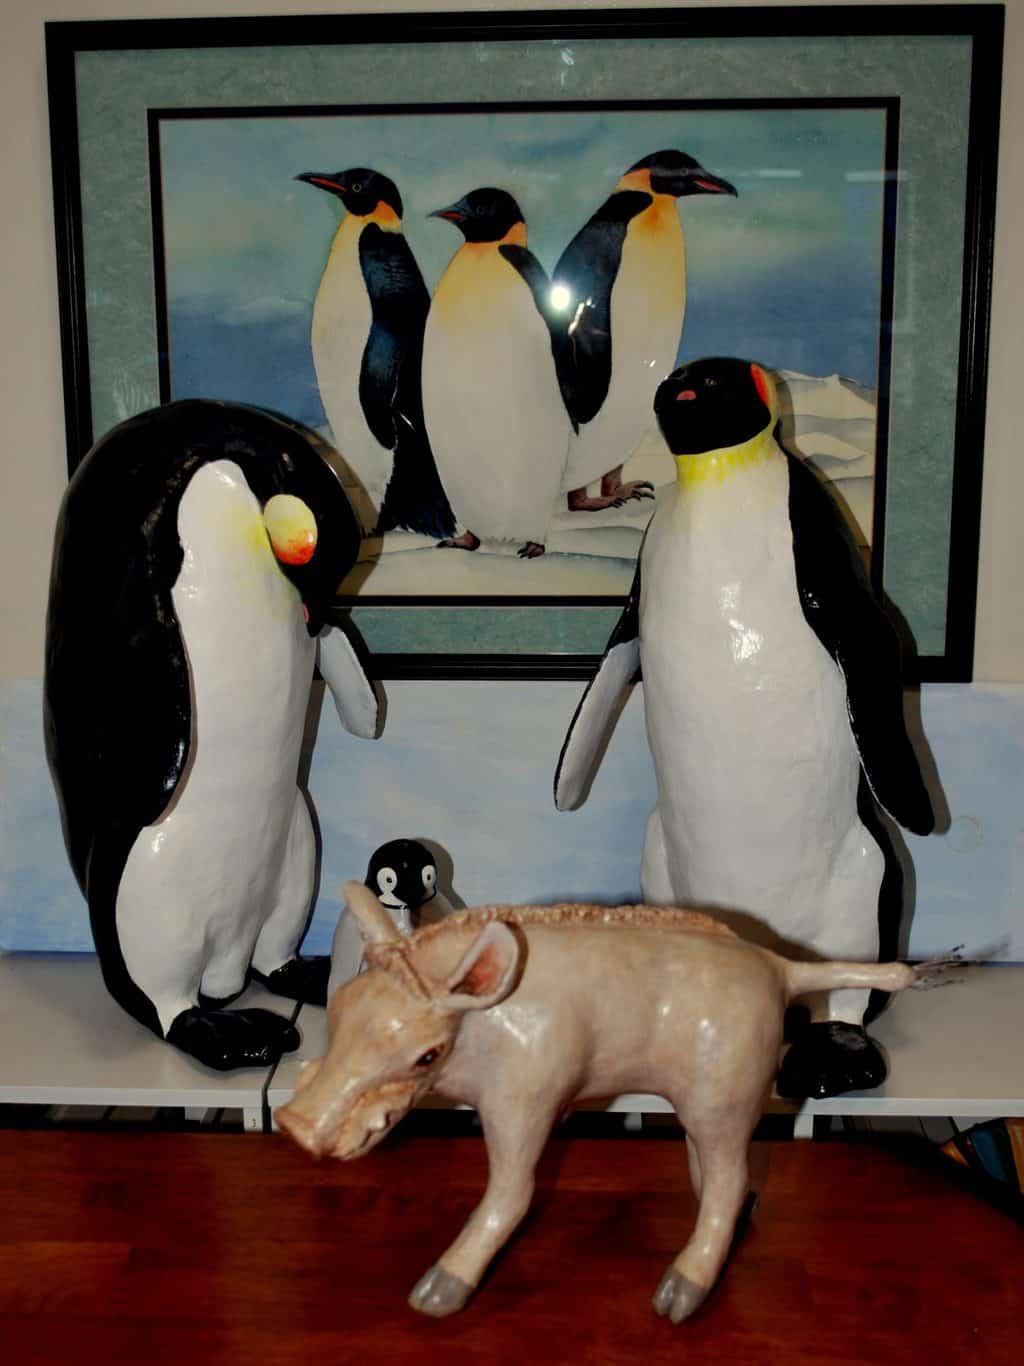 Penguins and warthog made by Rex Winn